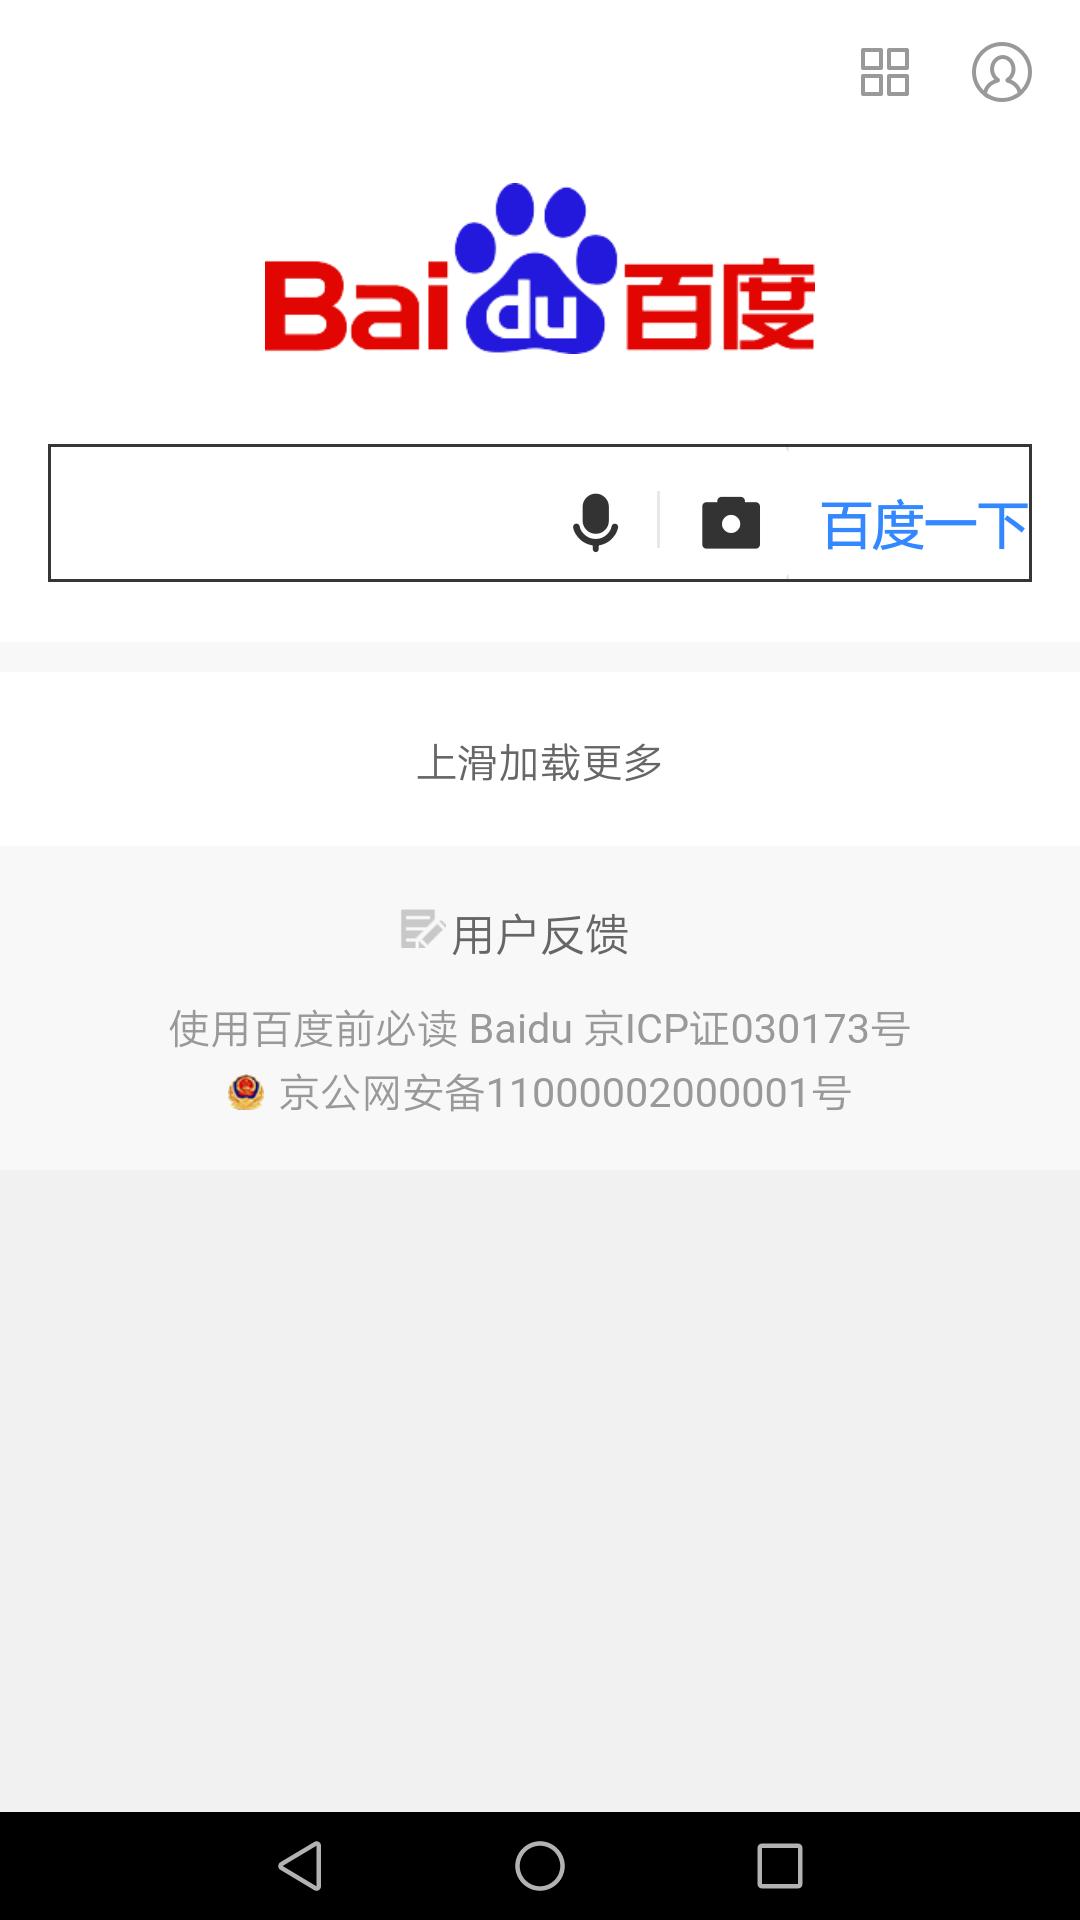 Android Baidu Screen 1